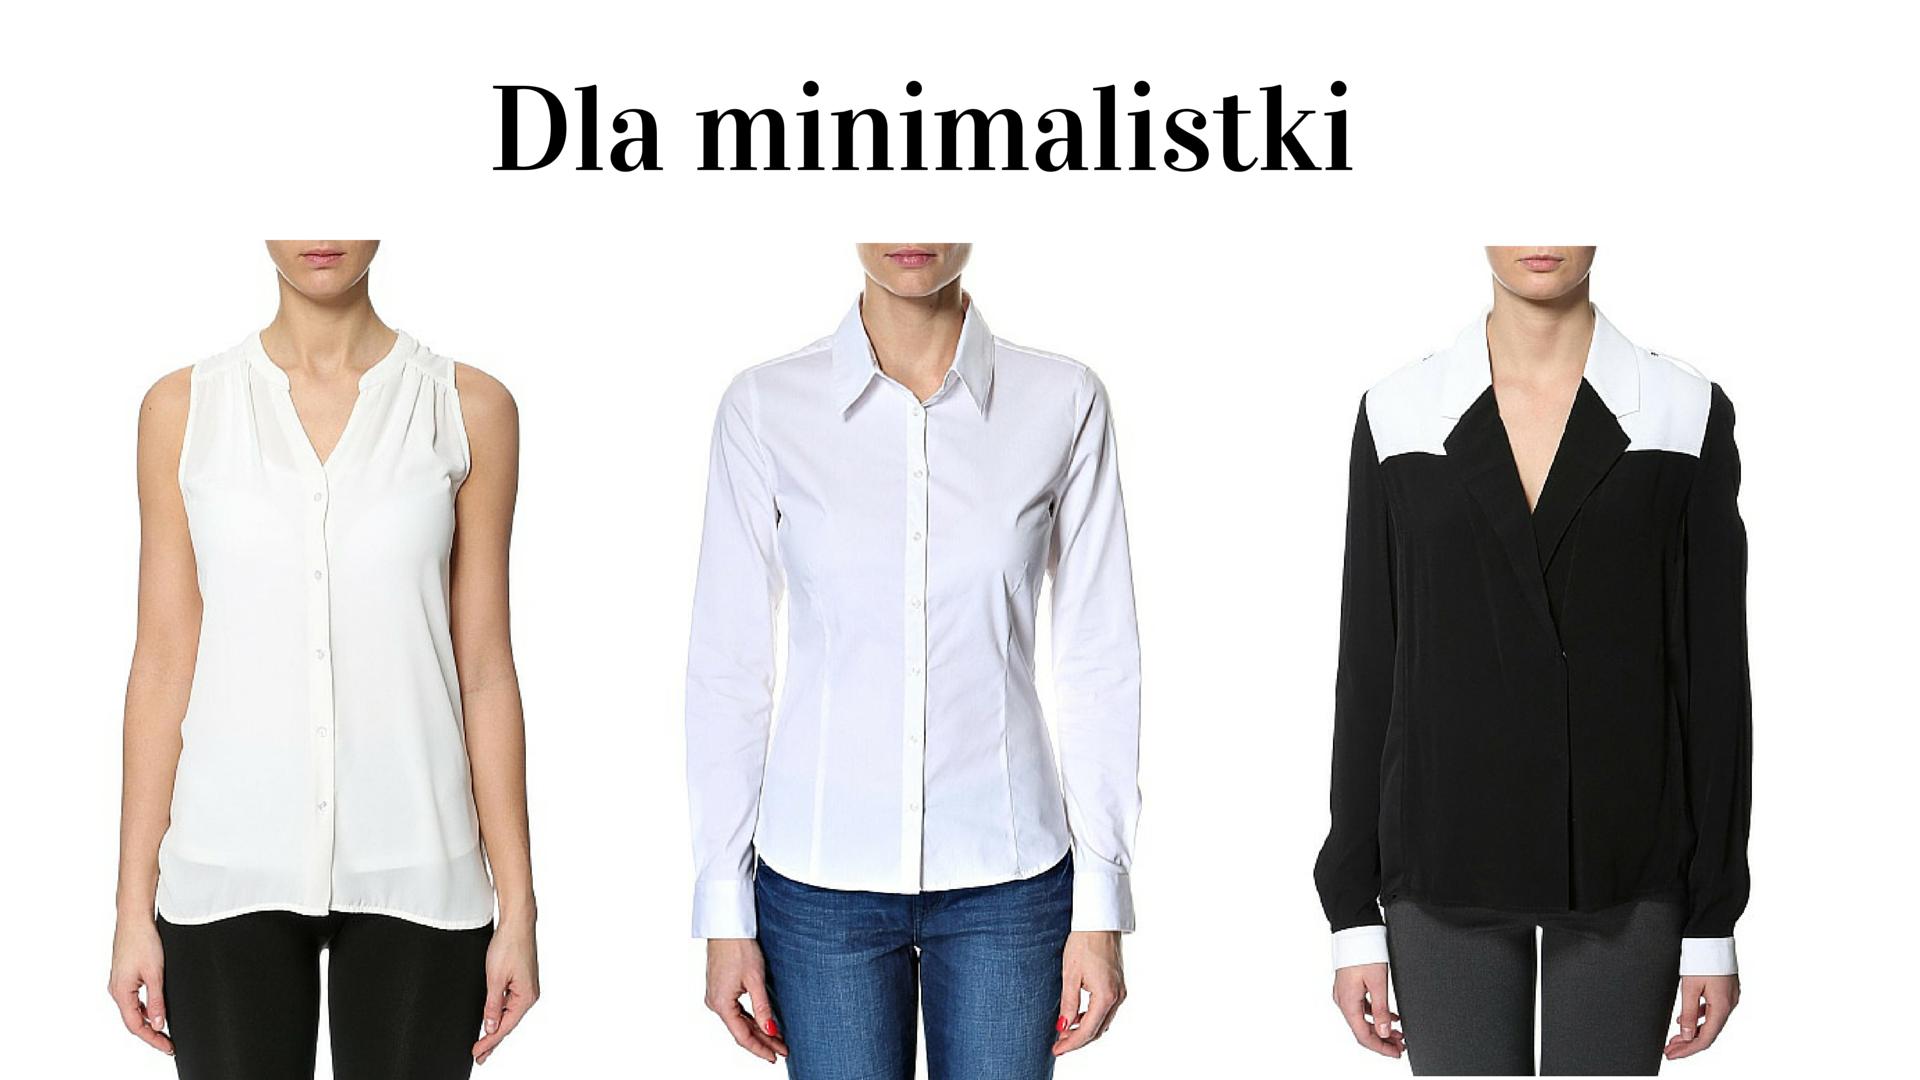 Dla minimalistki